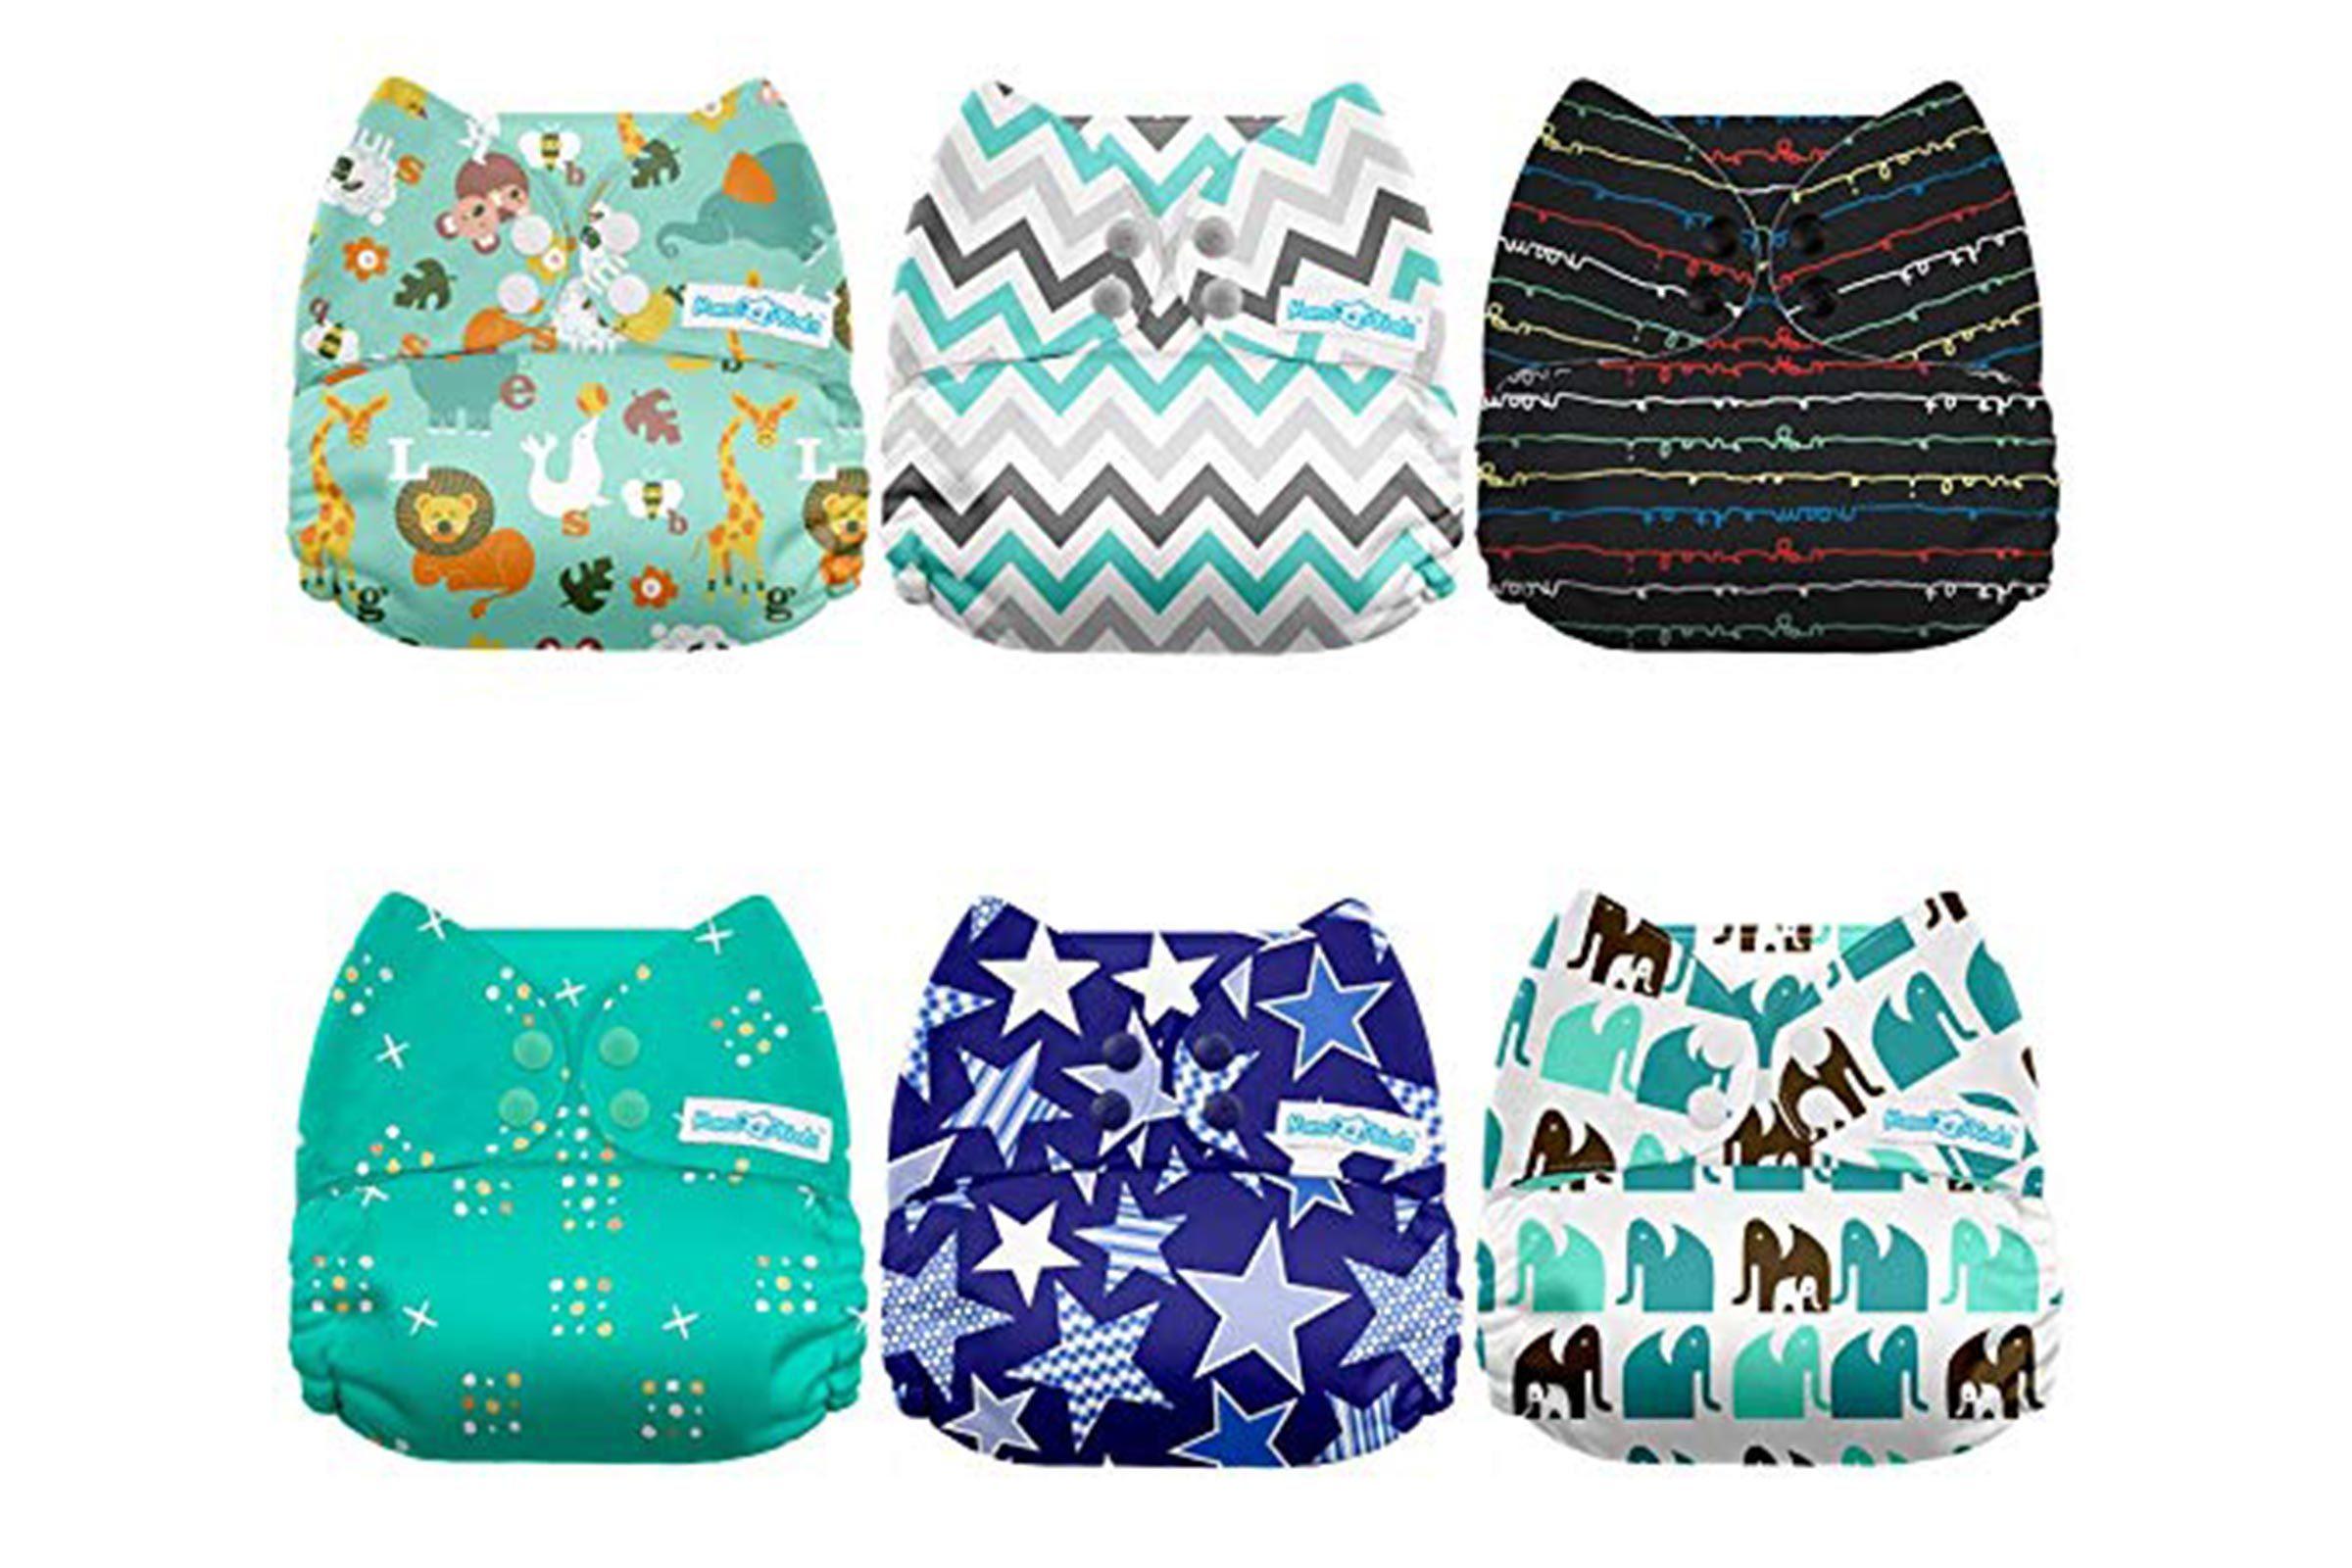 bags diapers